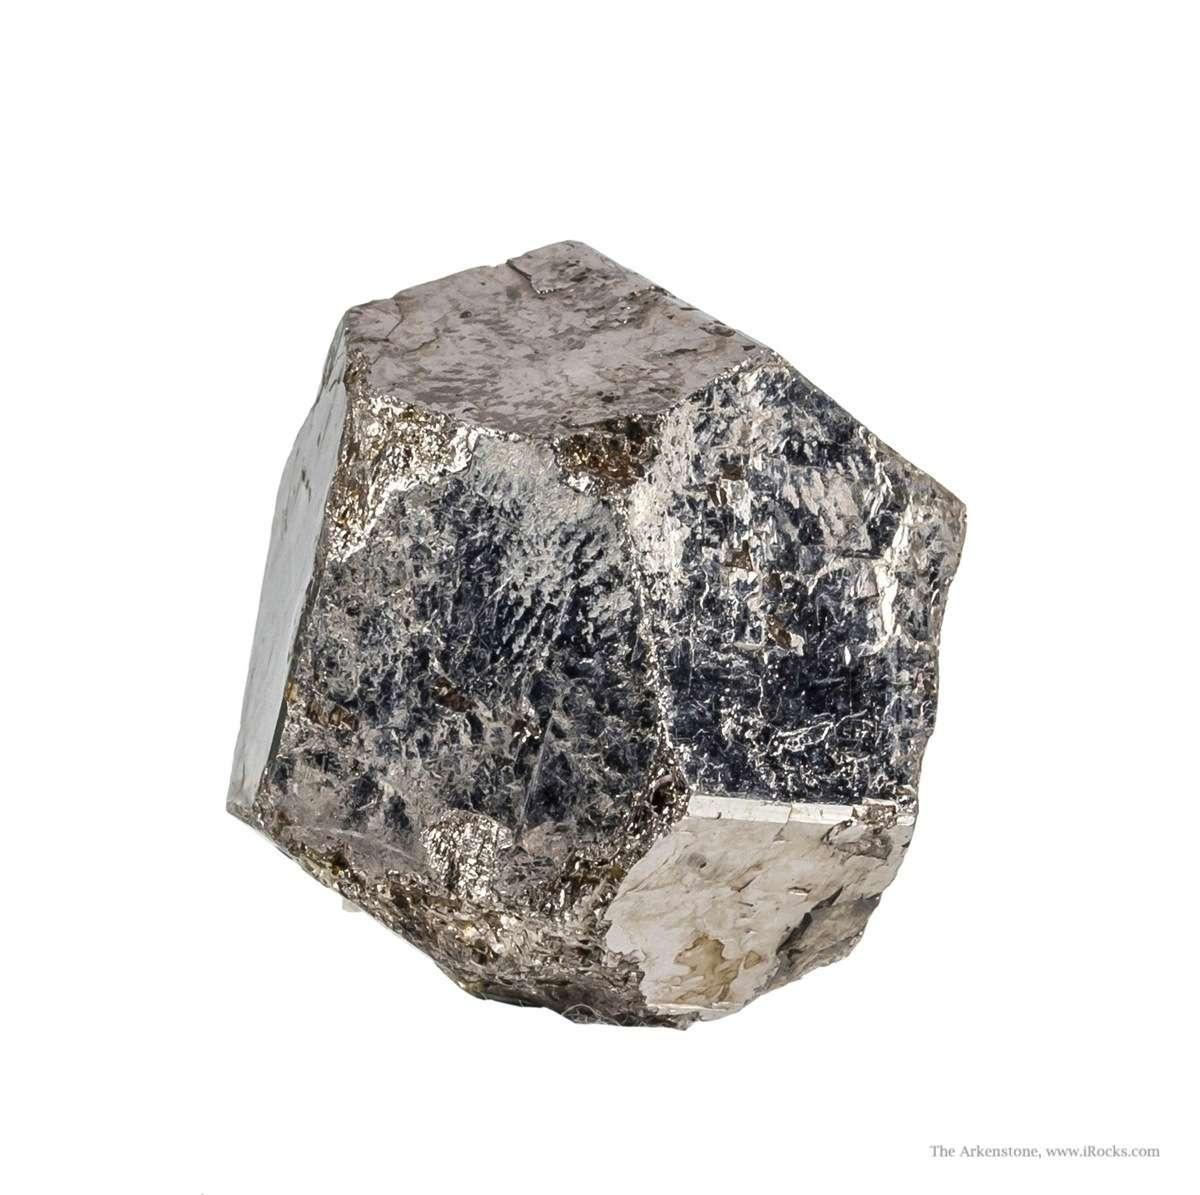 This sharp crystal amazingly symmetric like textbook diagram I seen